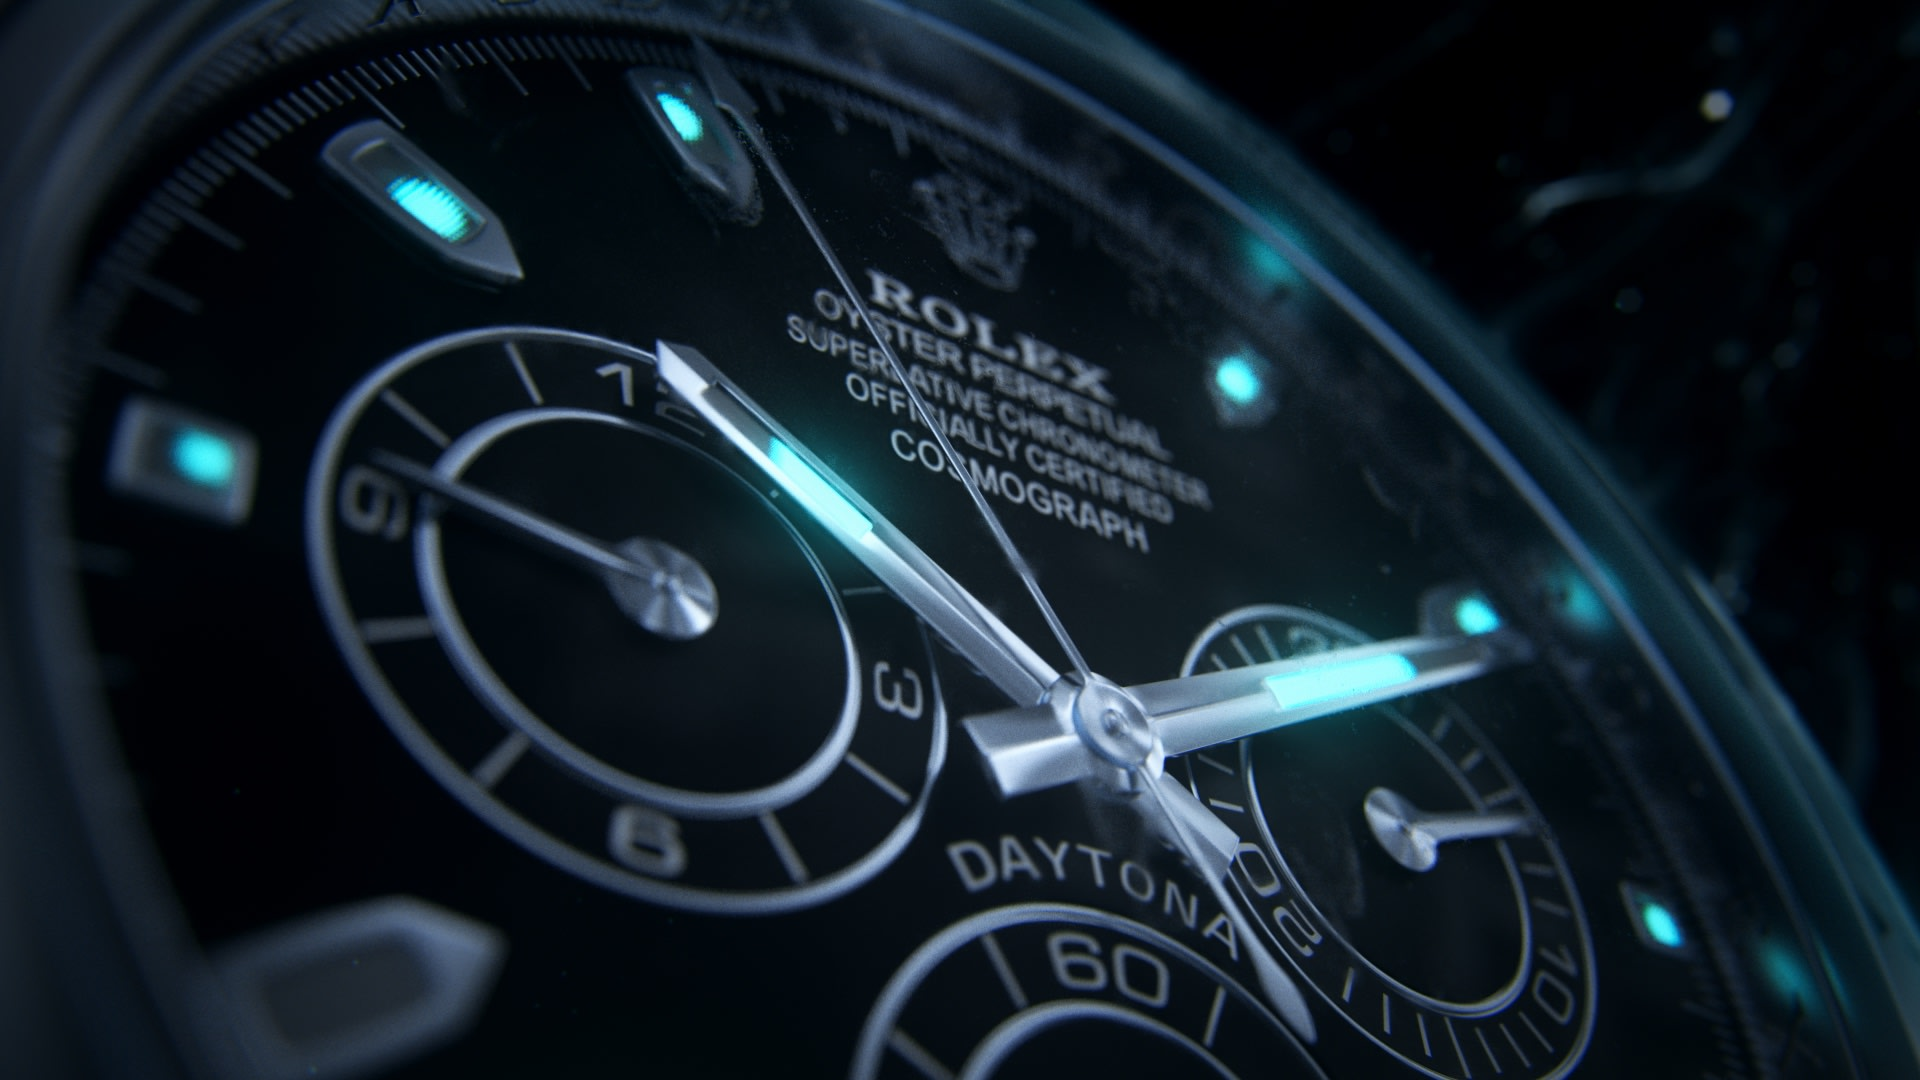 Rolex promotional 3d visual